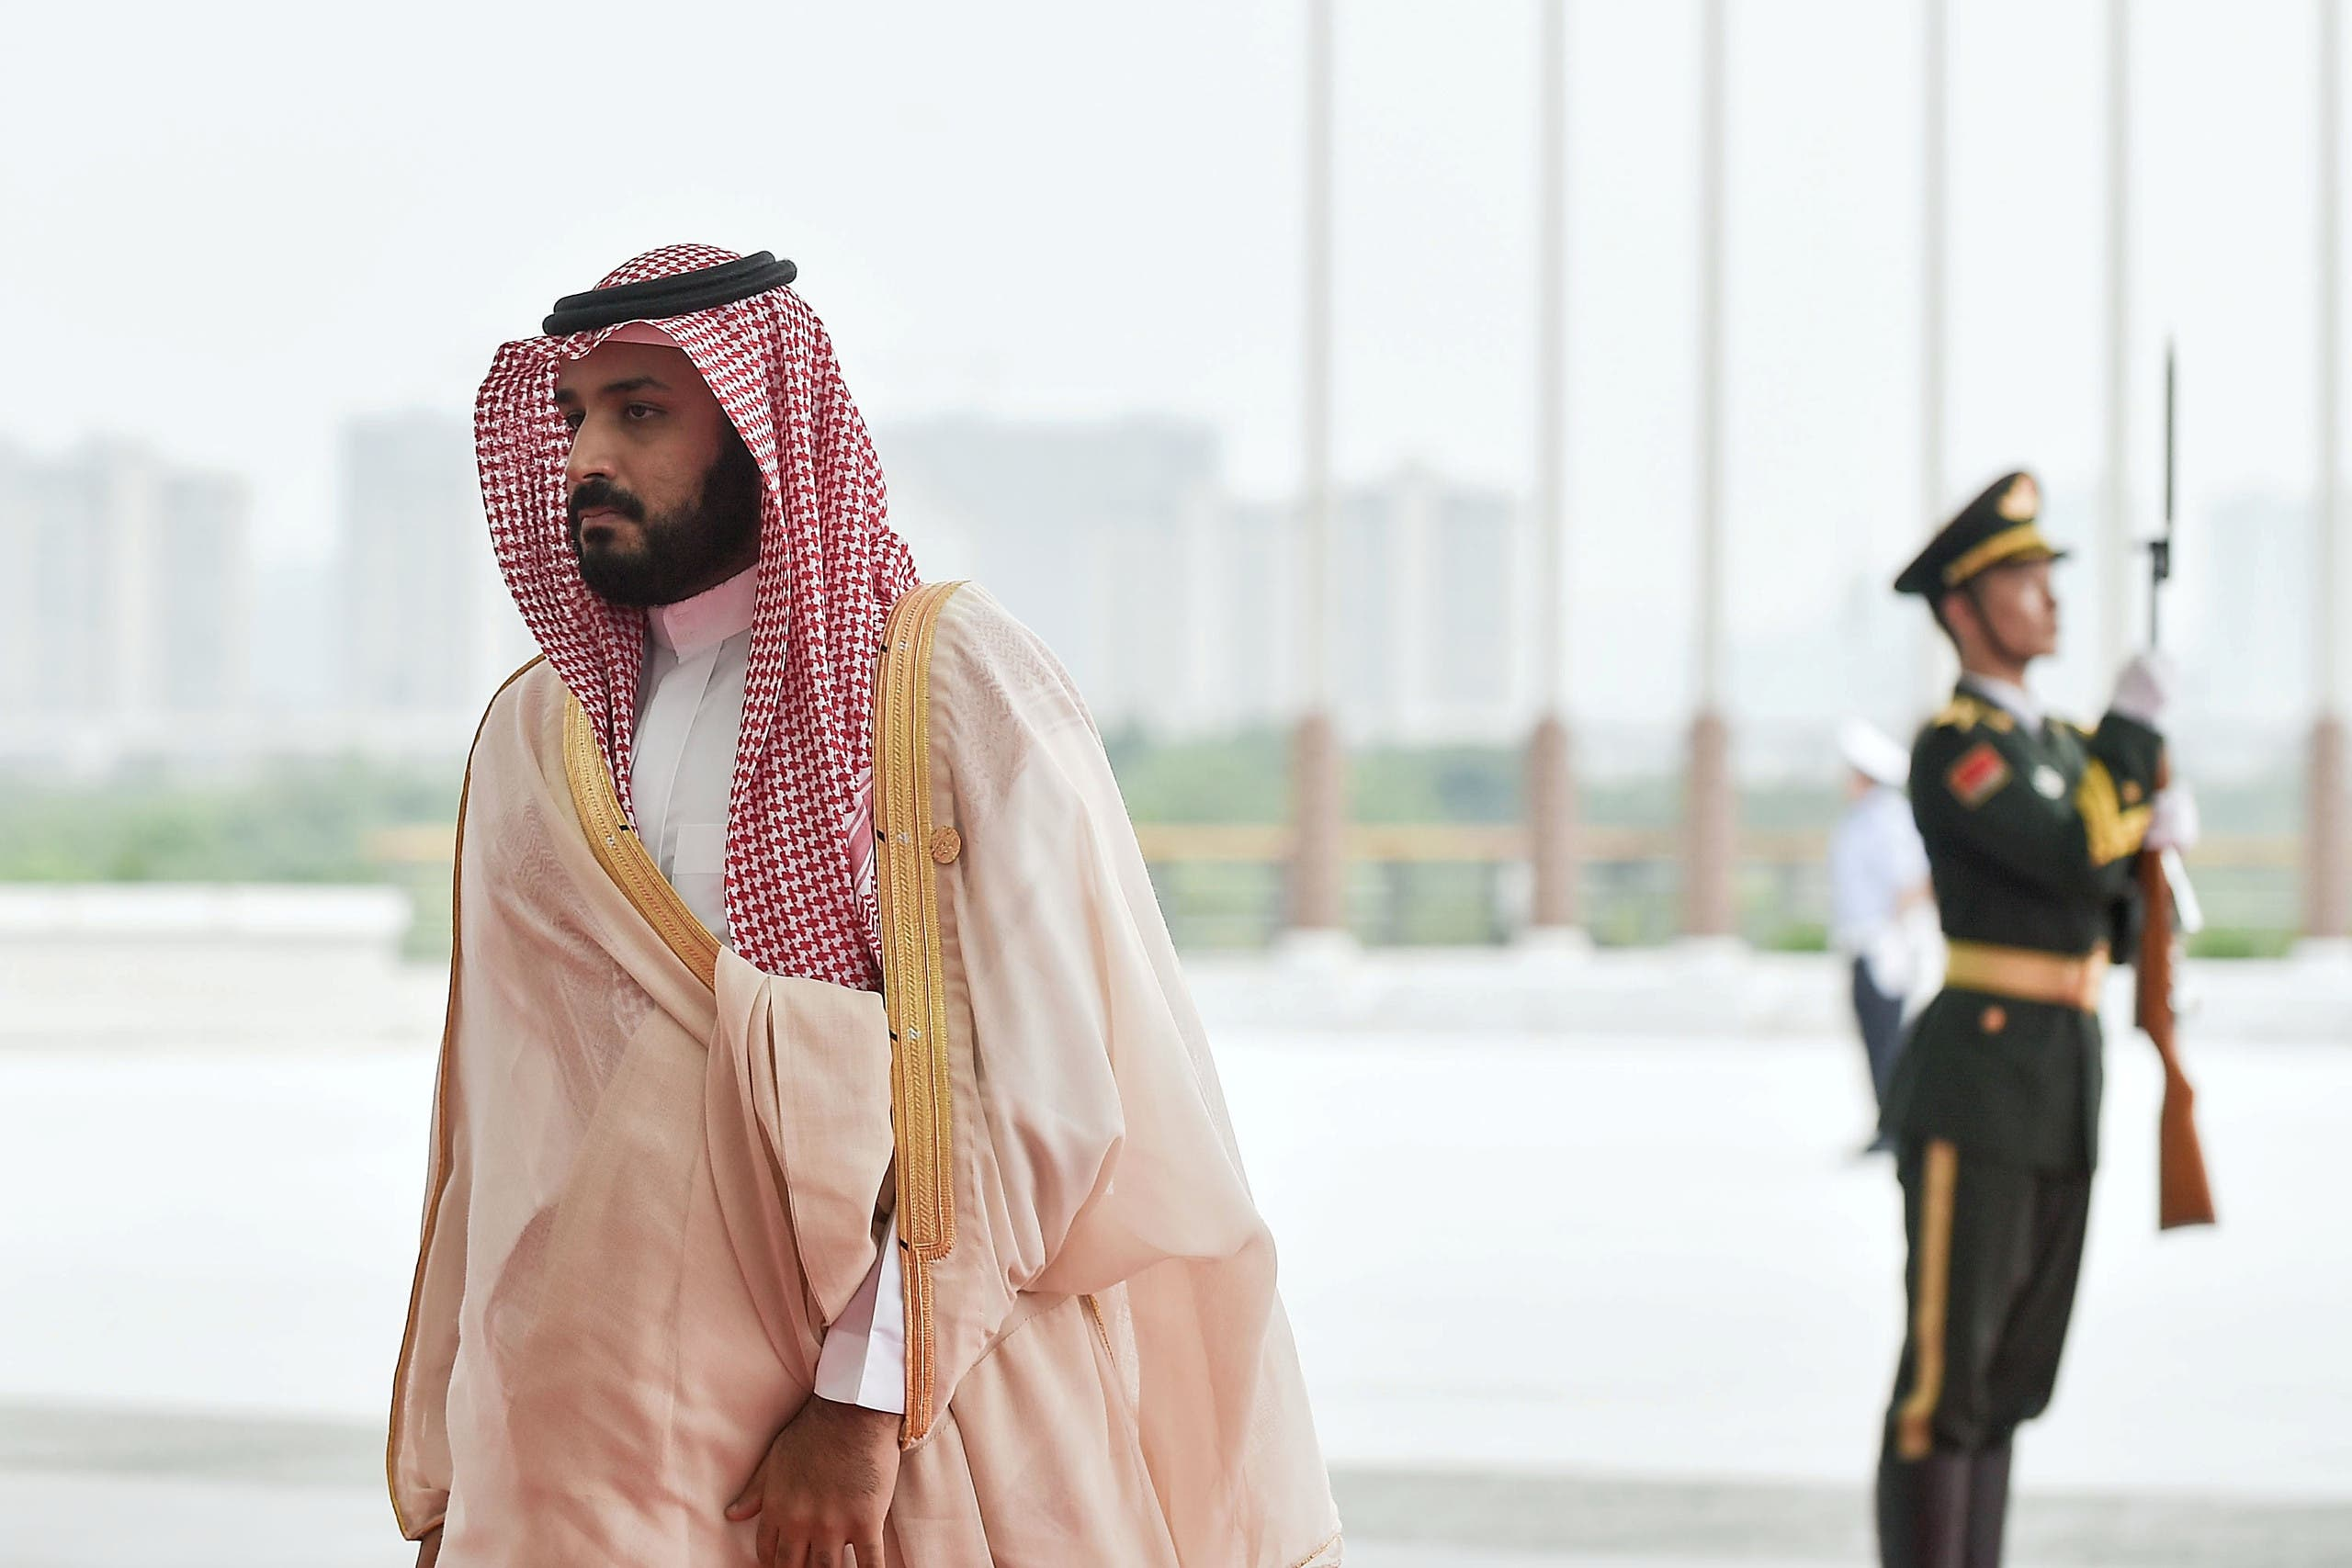 IN PICTURES: Saudi Crown Prince Mohammed bin Salman - Al Arabiya English